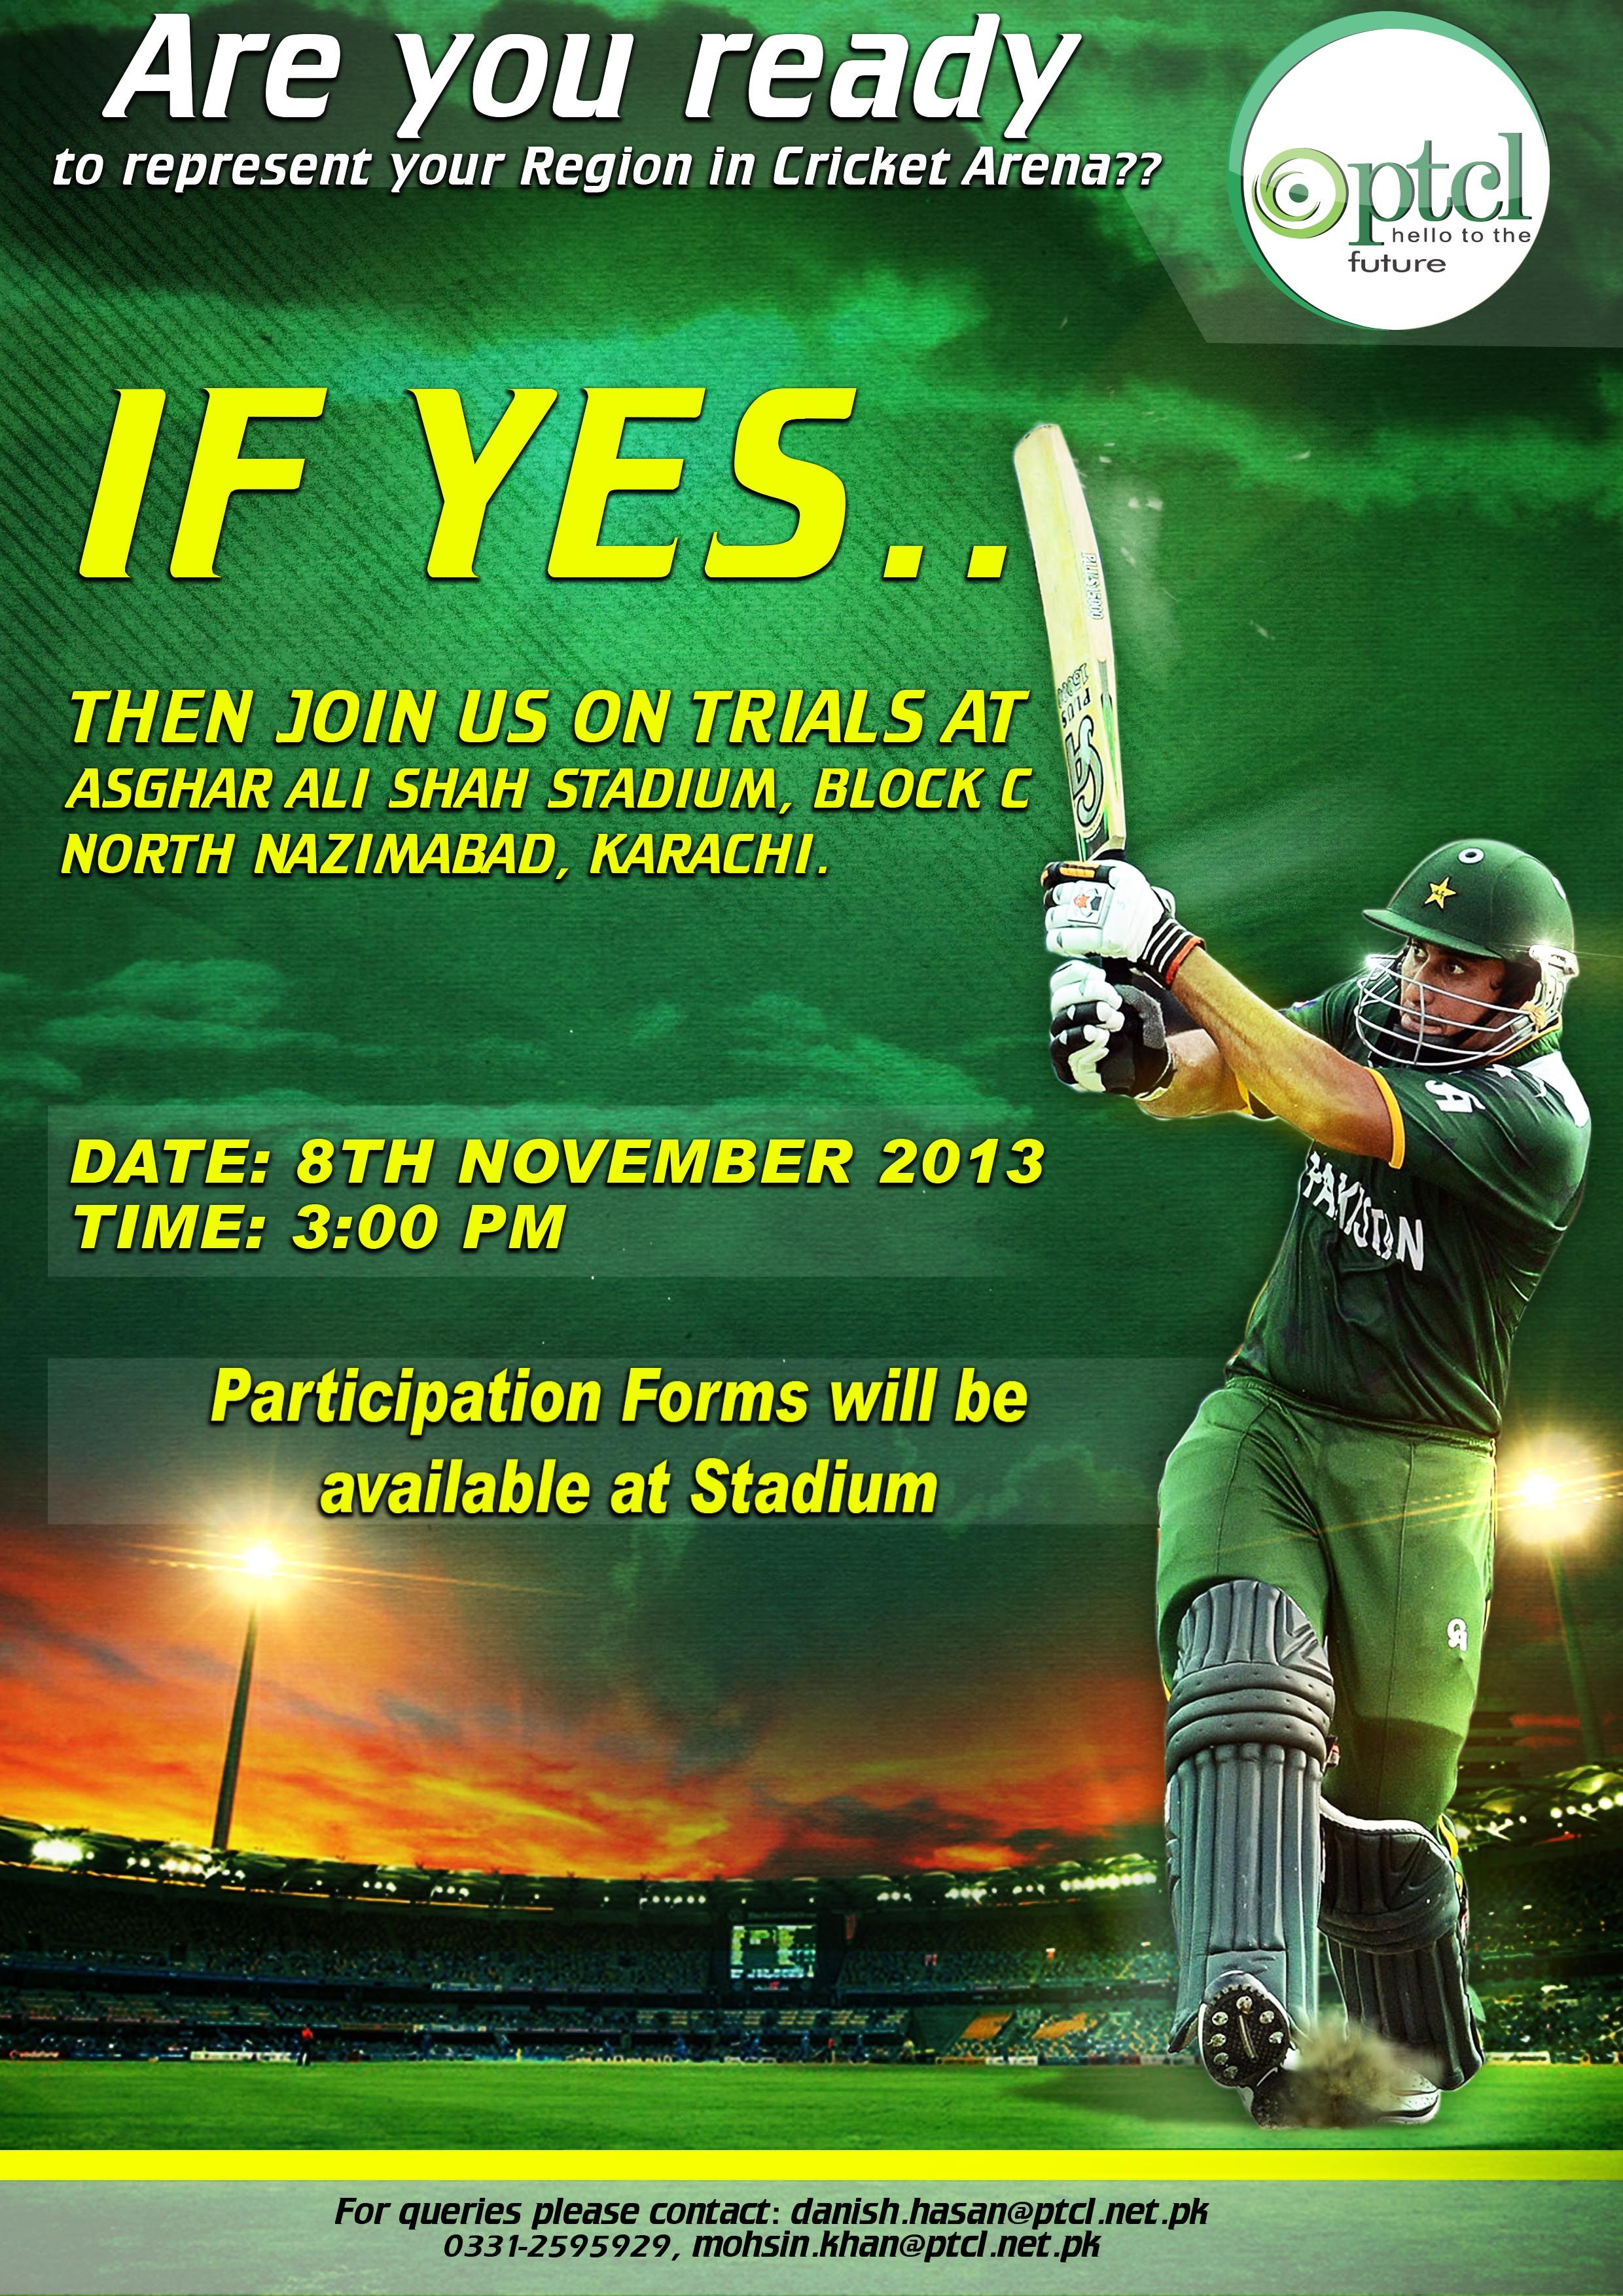 Poster 02 Ptcl Cricket Tournament Pinterest Cricket